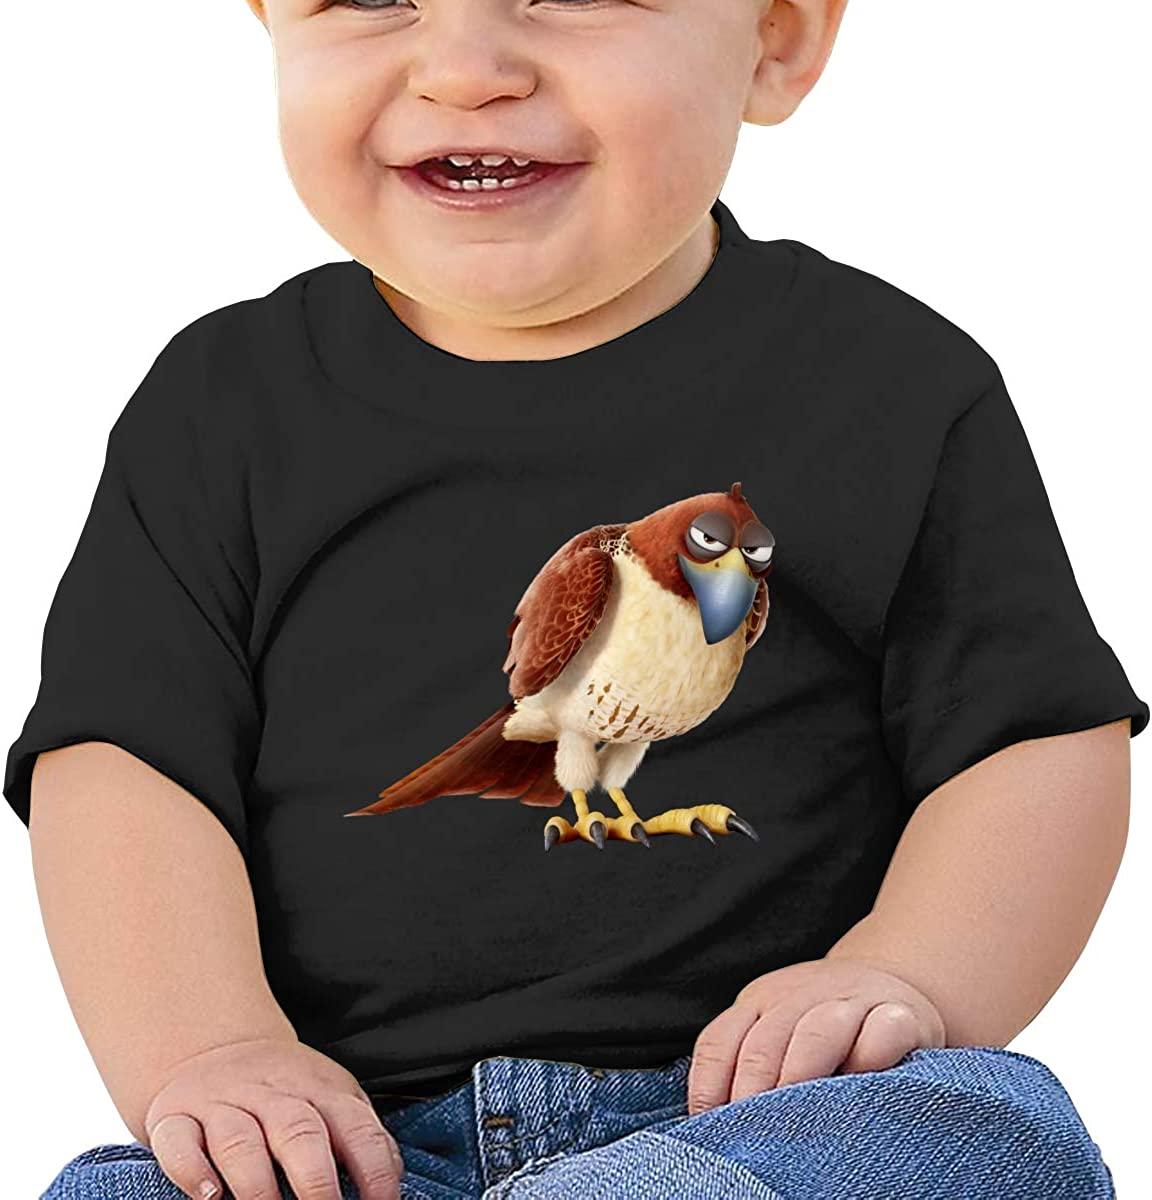 LIIREN Tiberius Tee Custom Cute T-Shirts for Infant Black